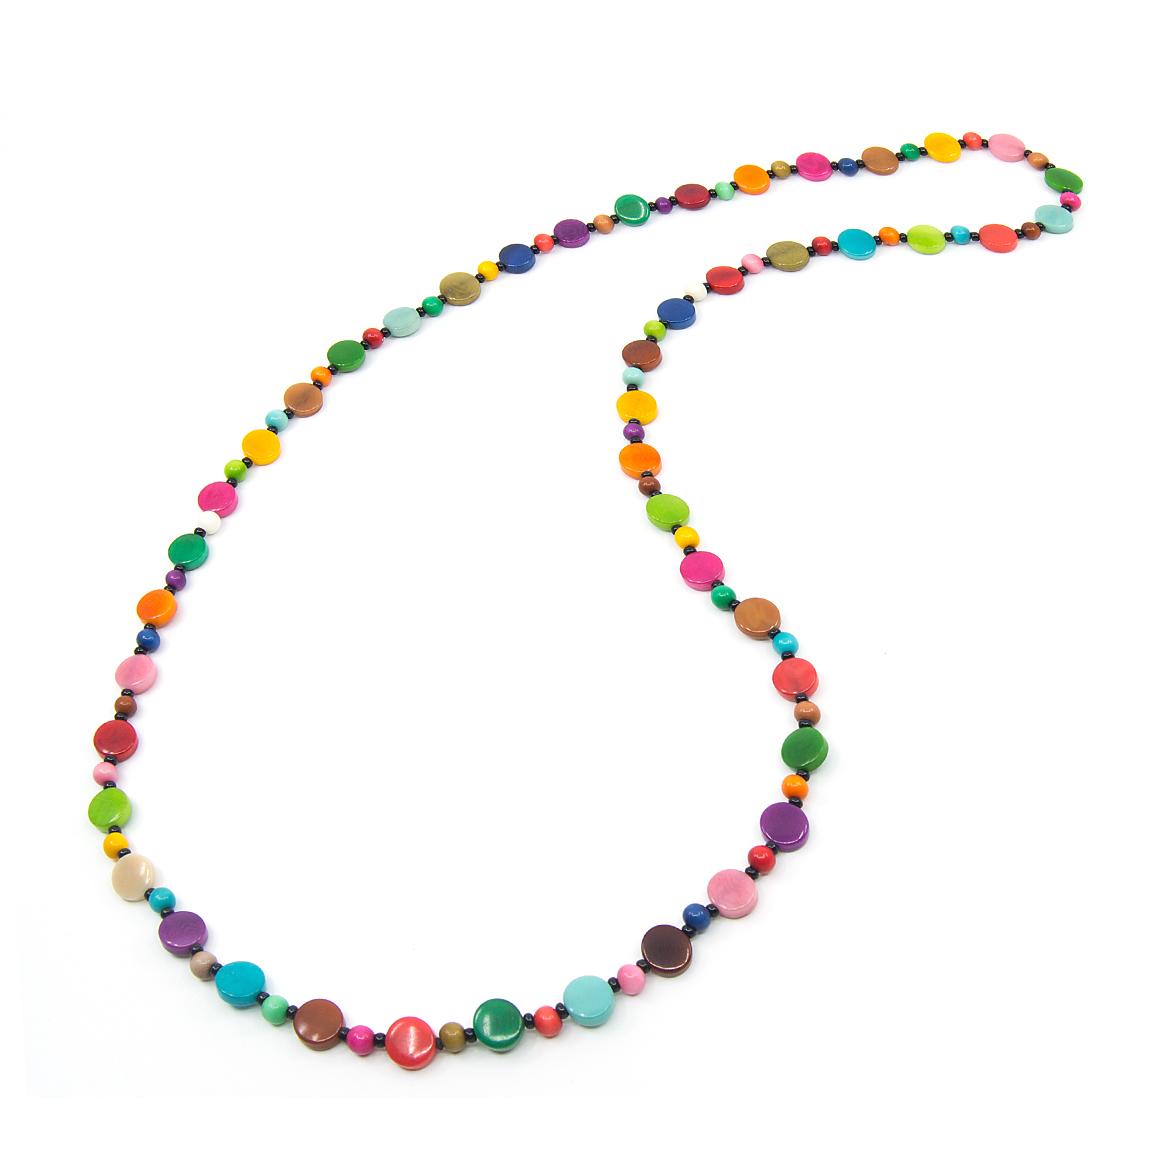 Colourfresh Tagua Necklace